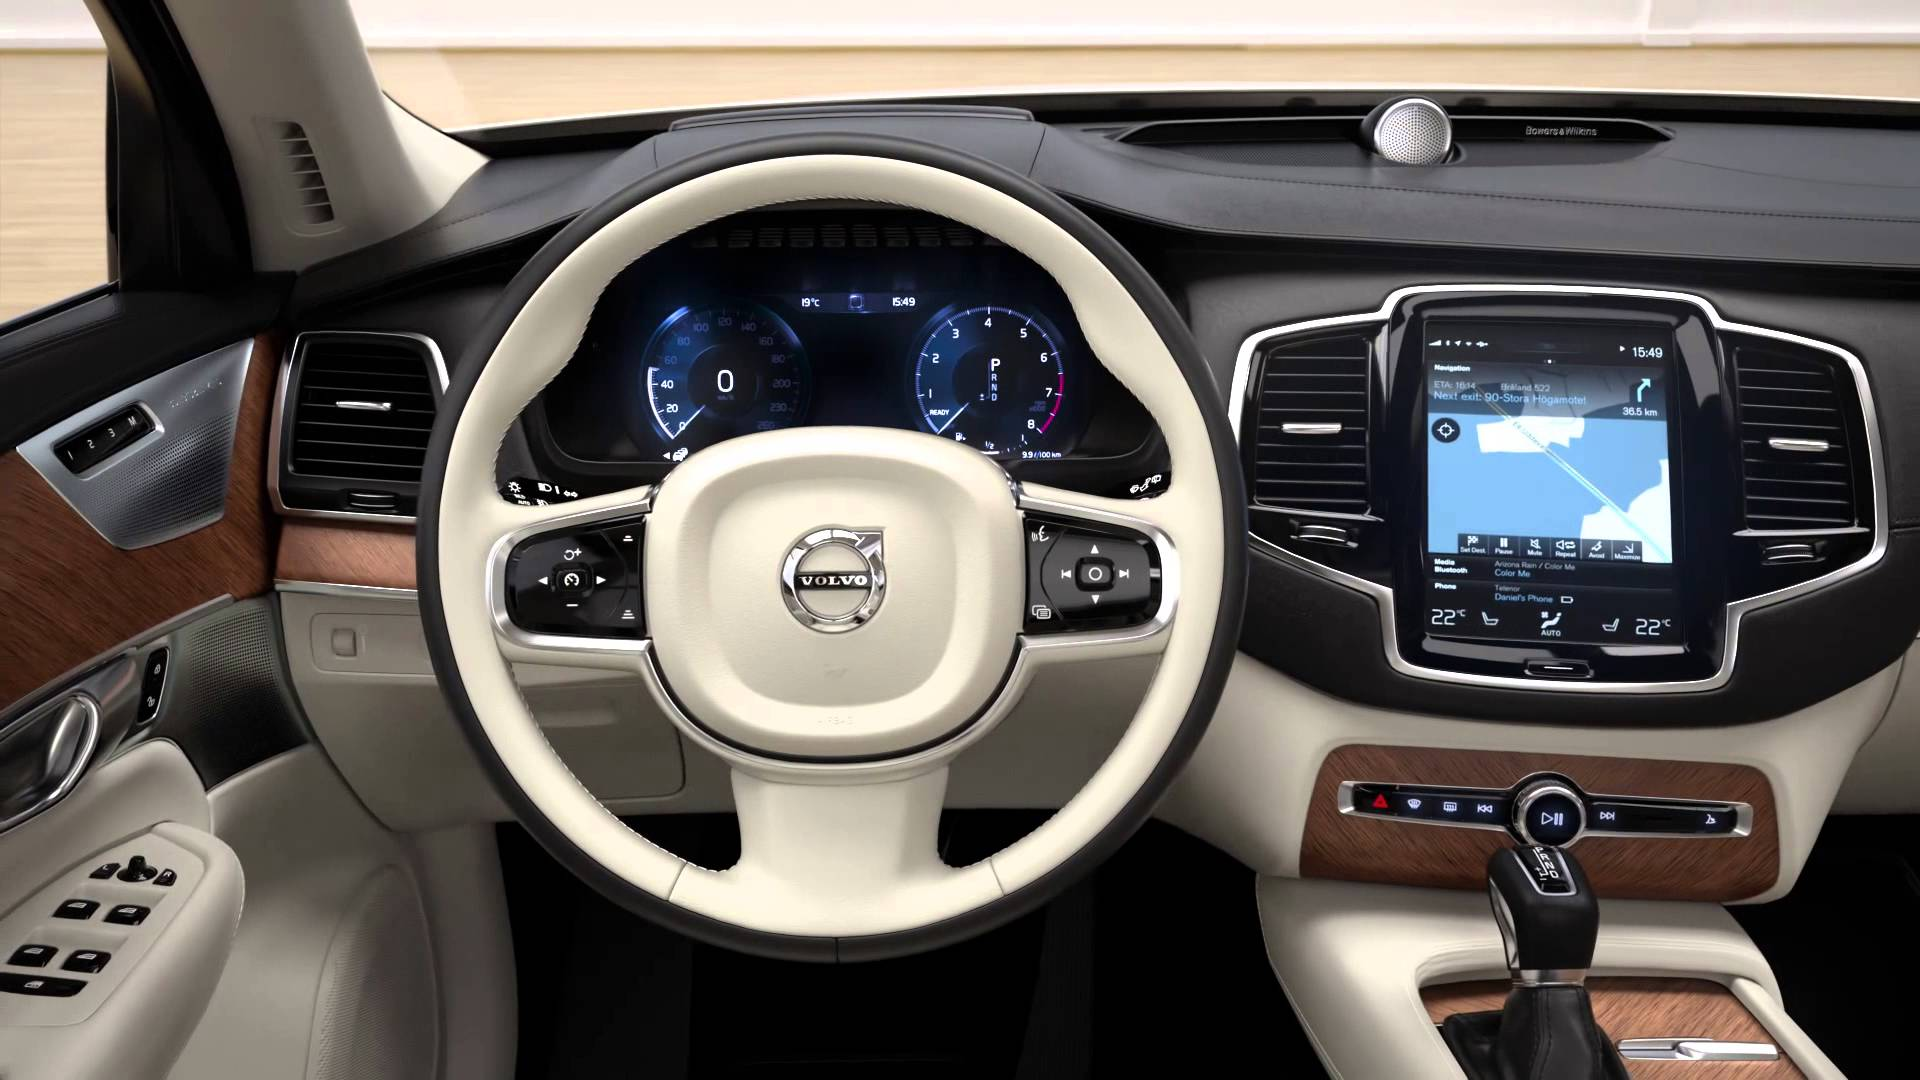 Volvo XC90 II Pictures